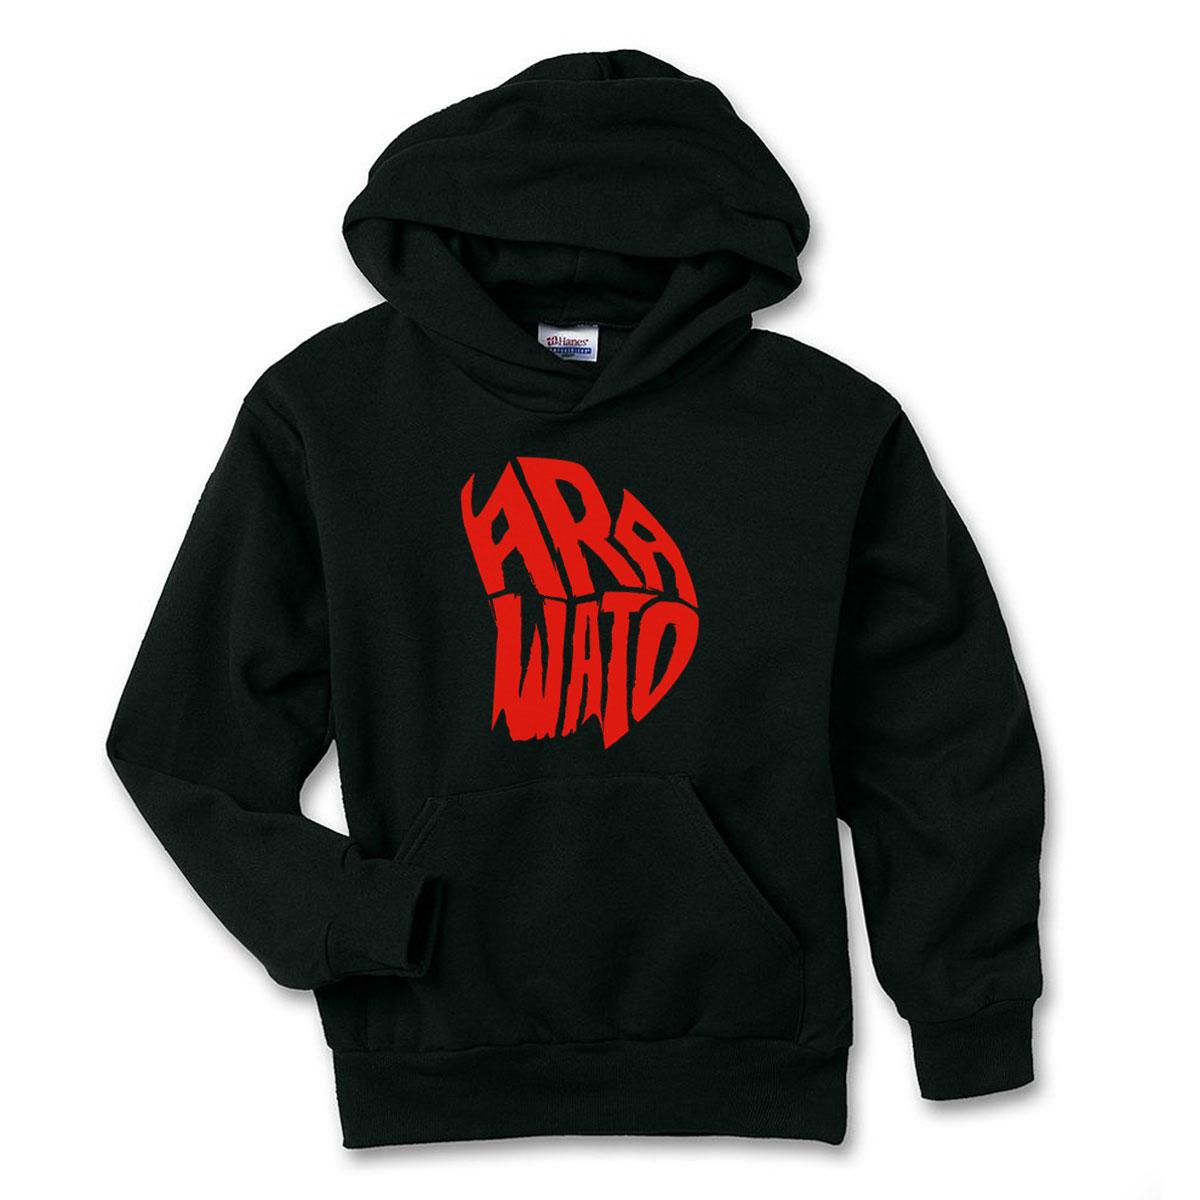 Hoodie Negro - 30$